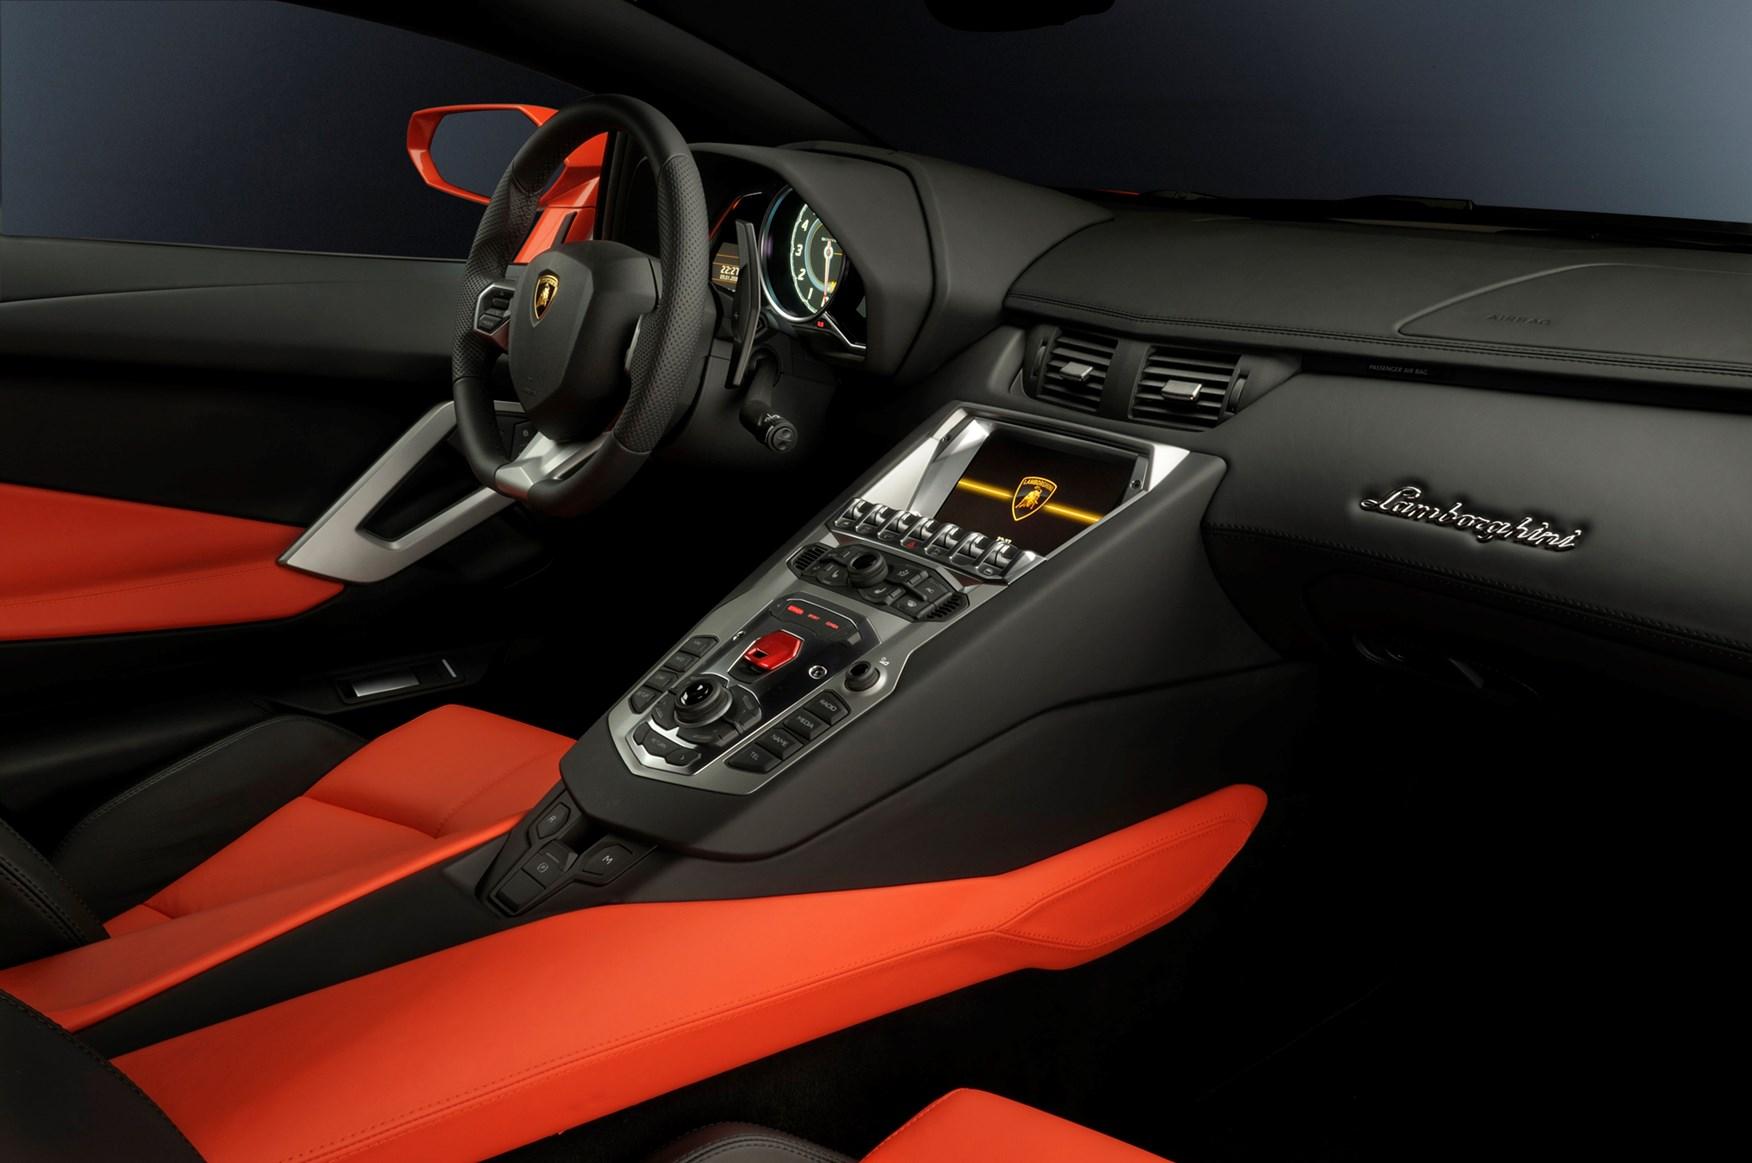 Lamborghini Aventador Coupe 2011 Features Equipment And